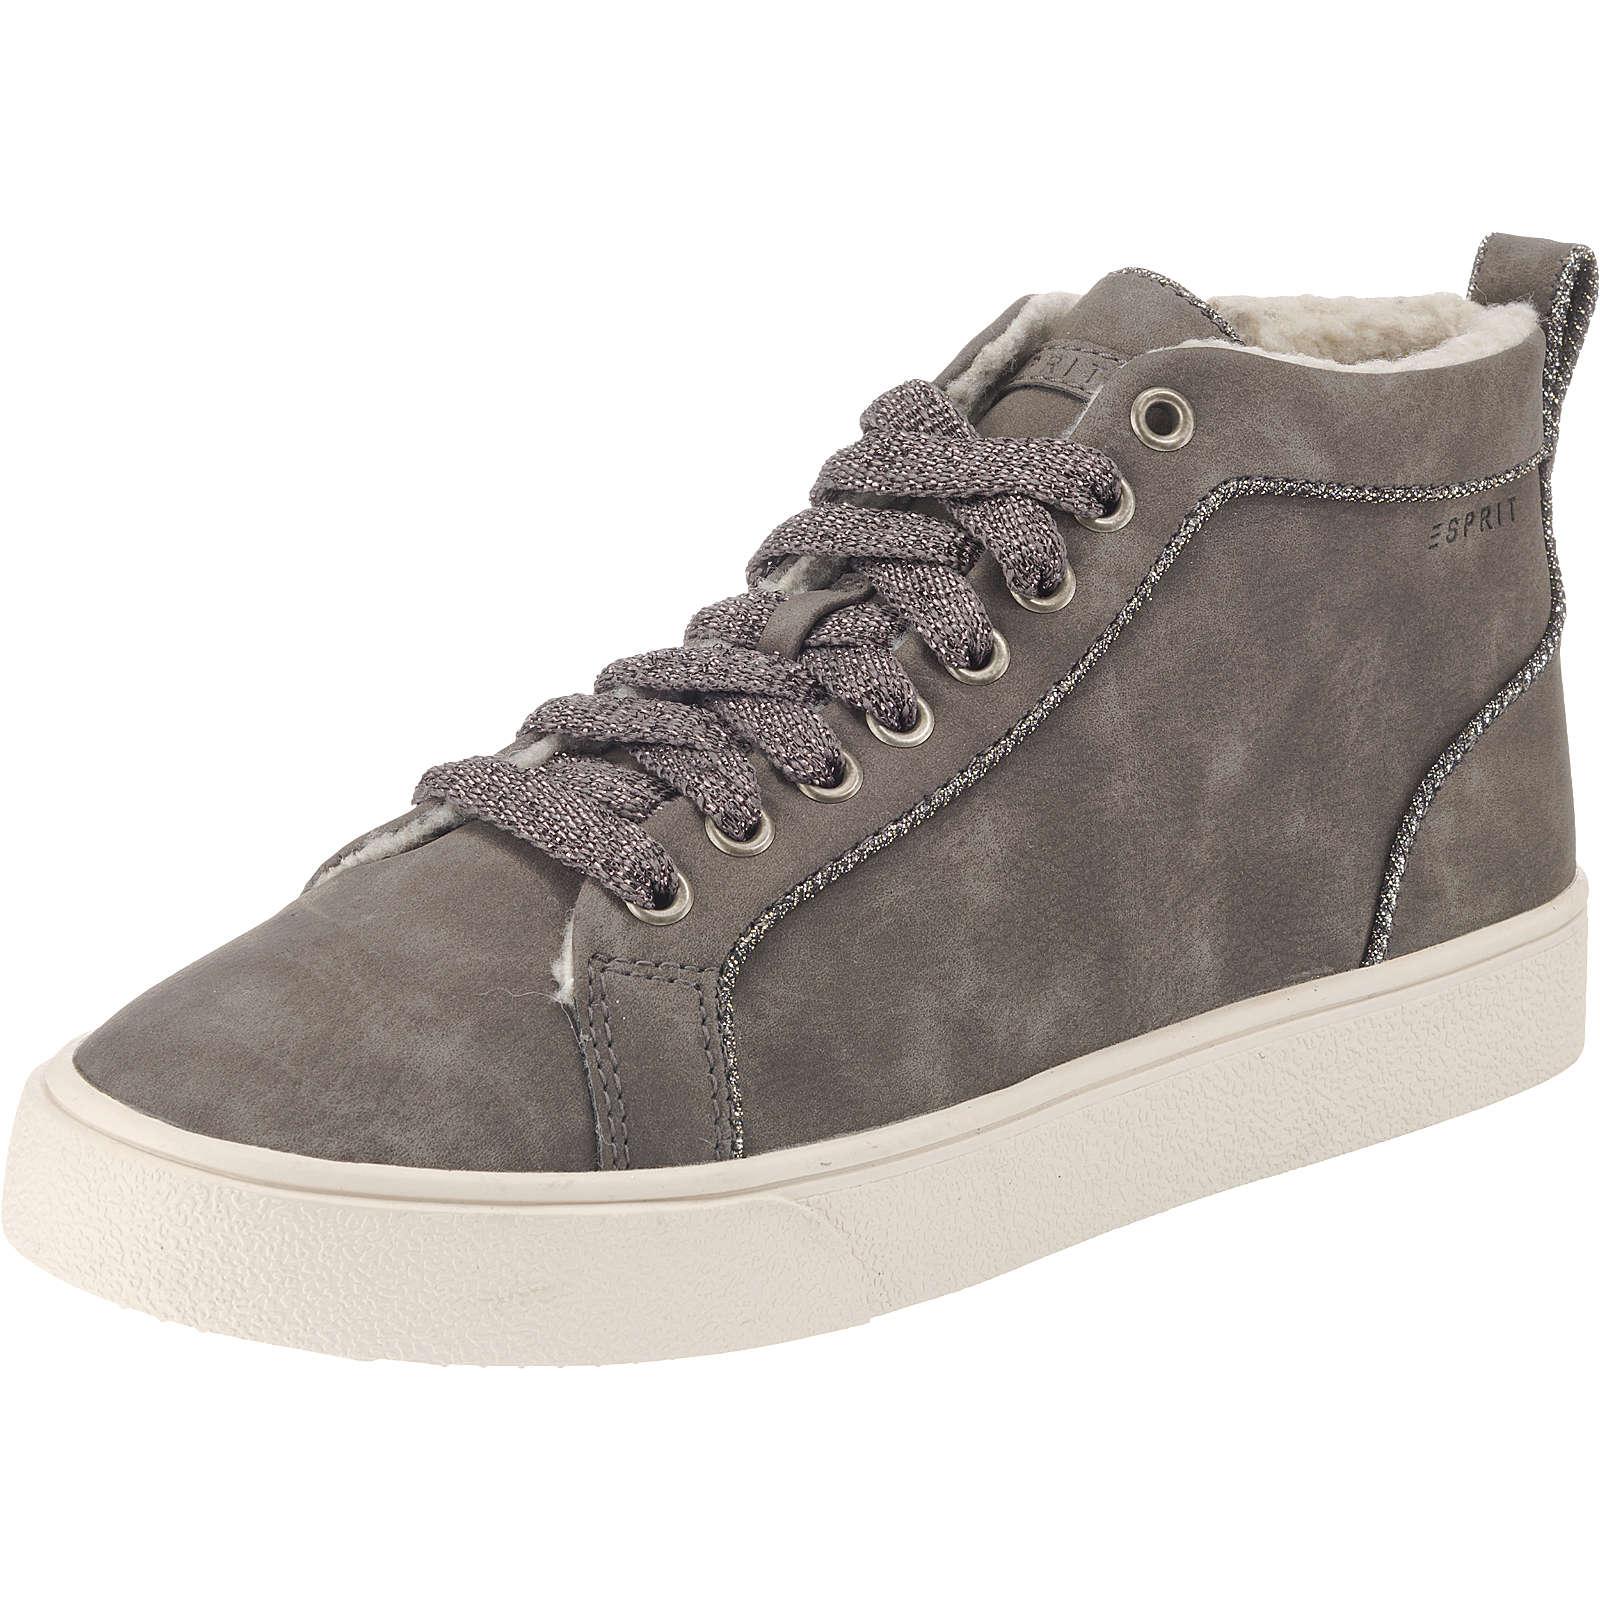 ESPRIT CHERRY Sneakers High grau Damen Gr. 40